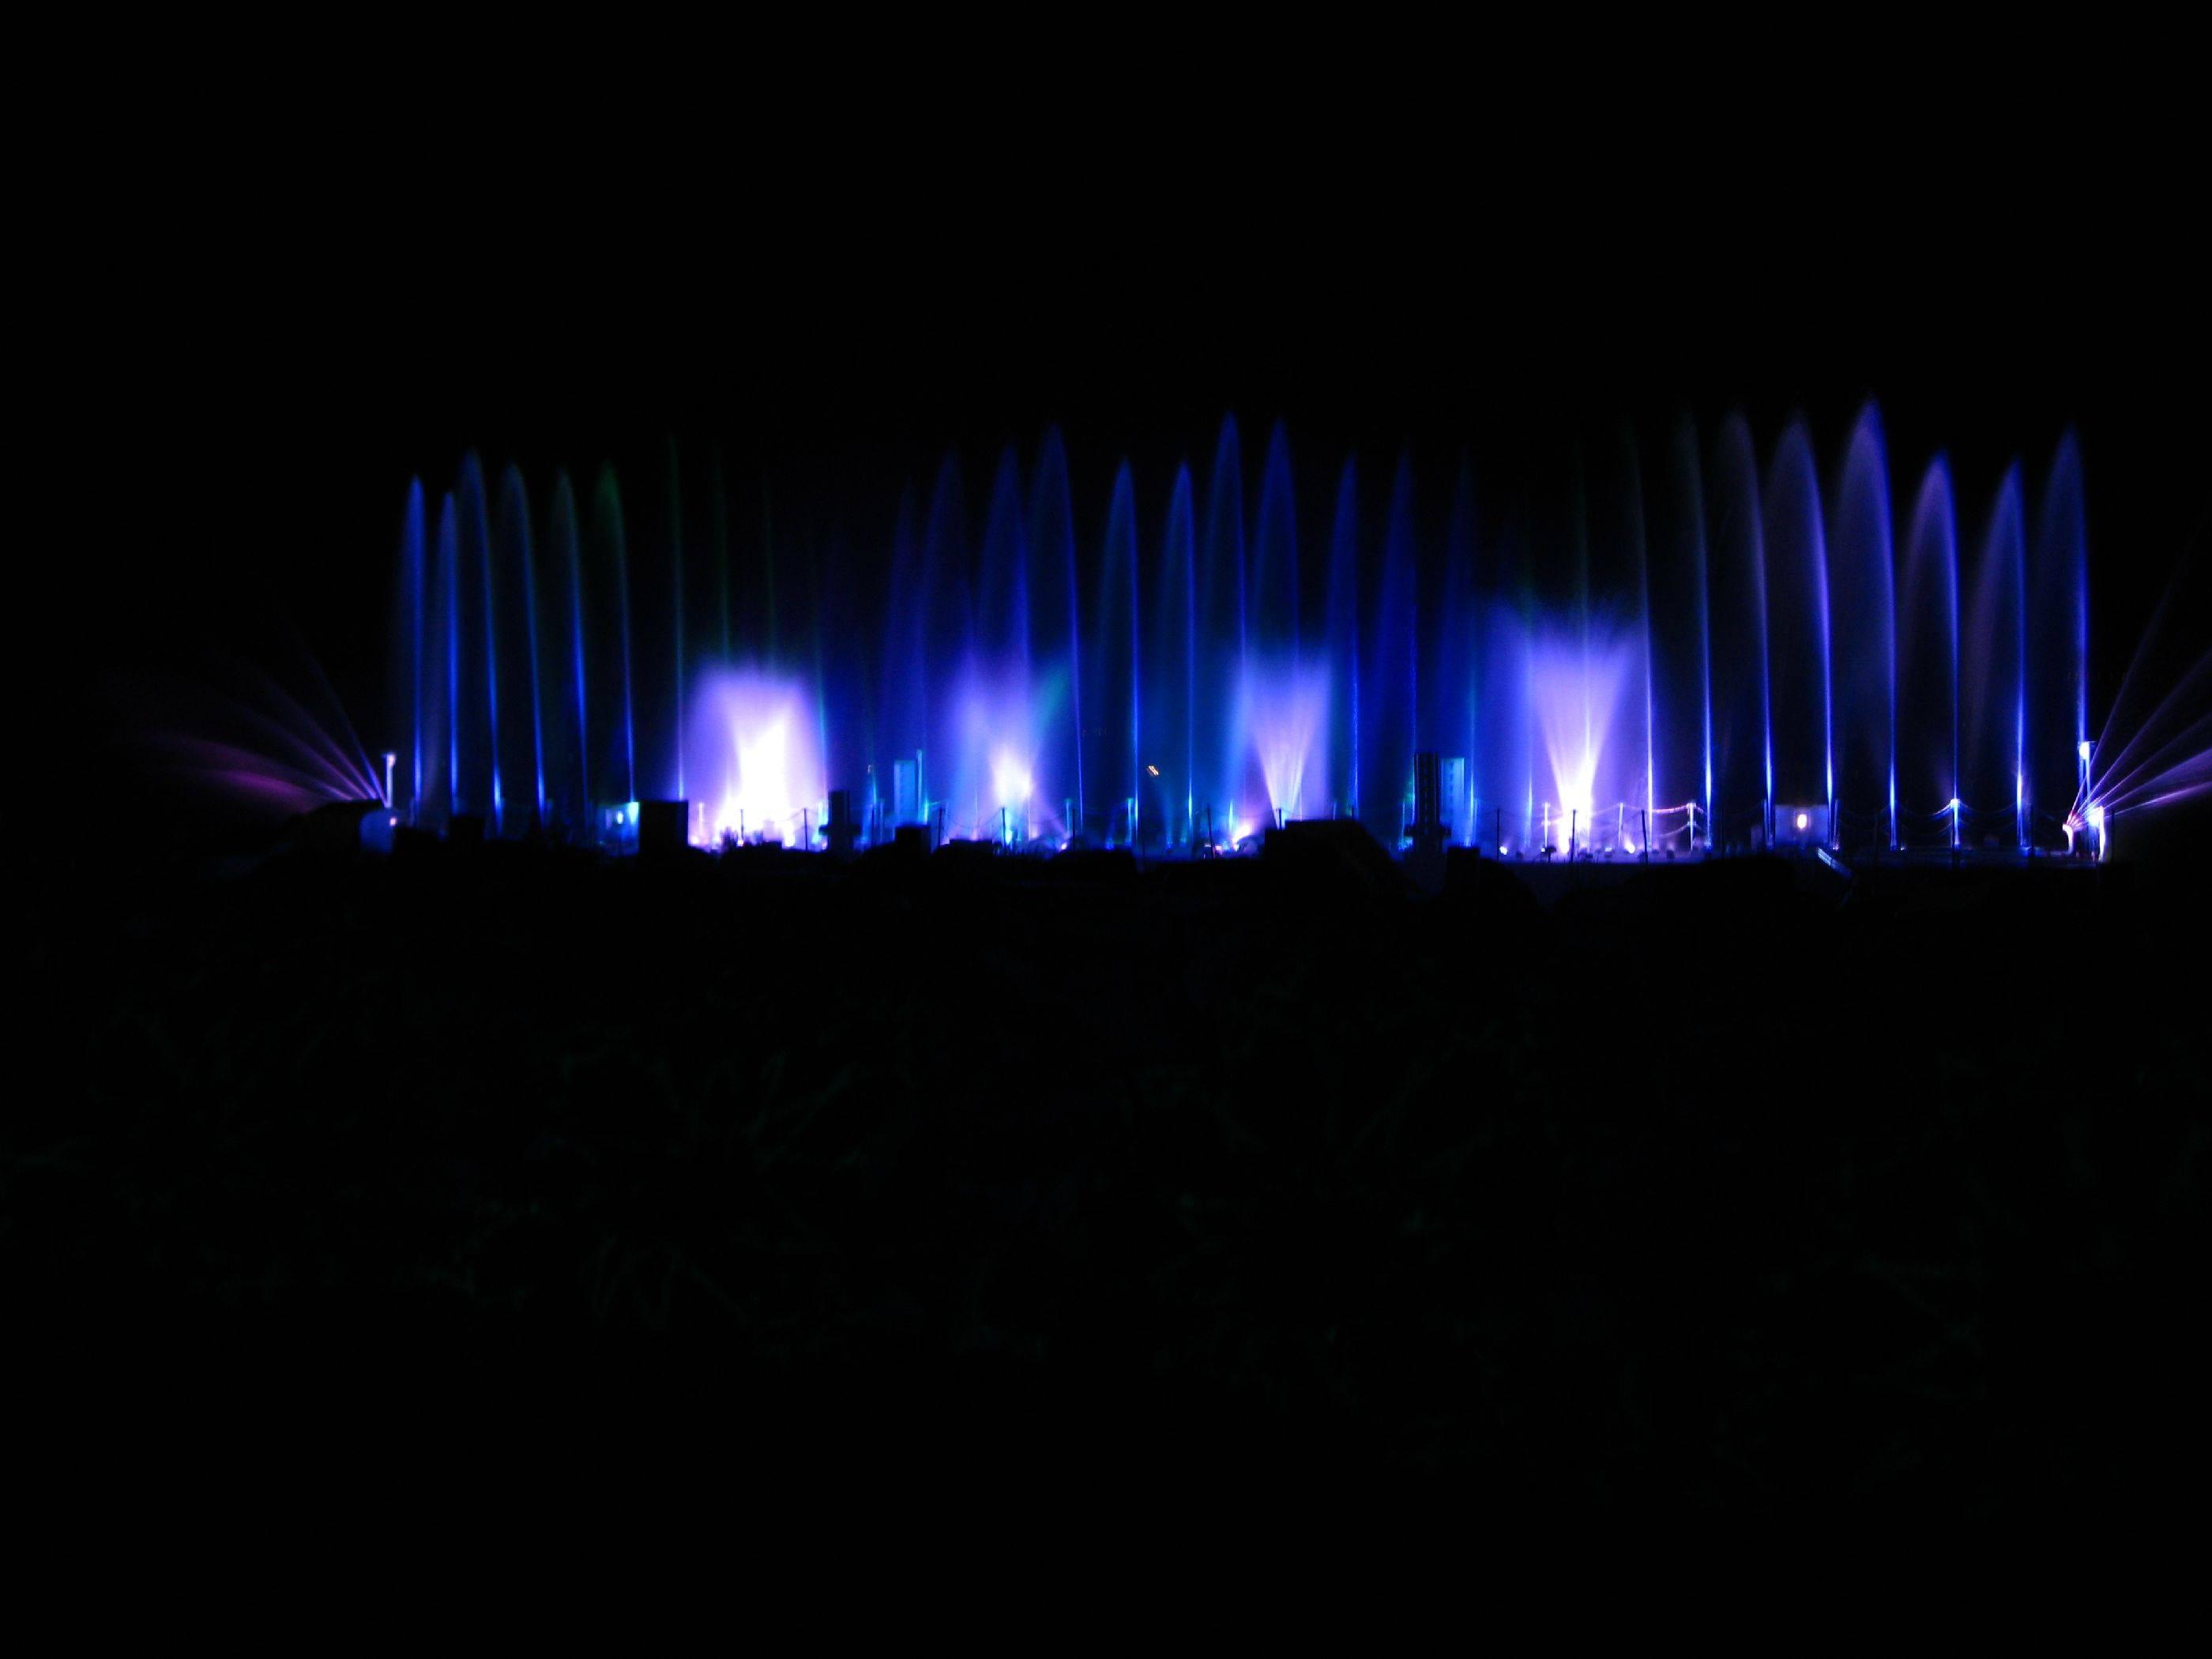 Blue Lights 2